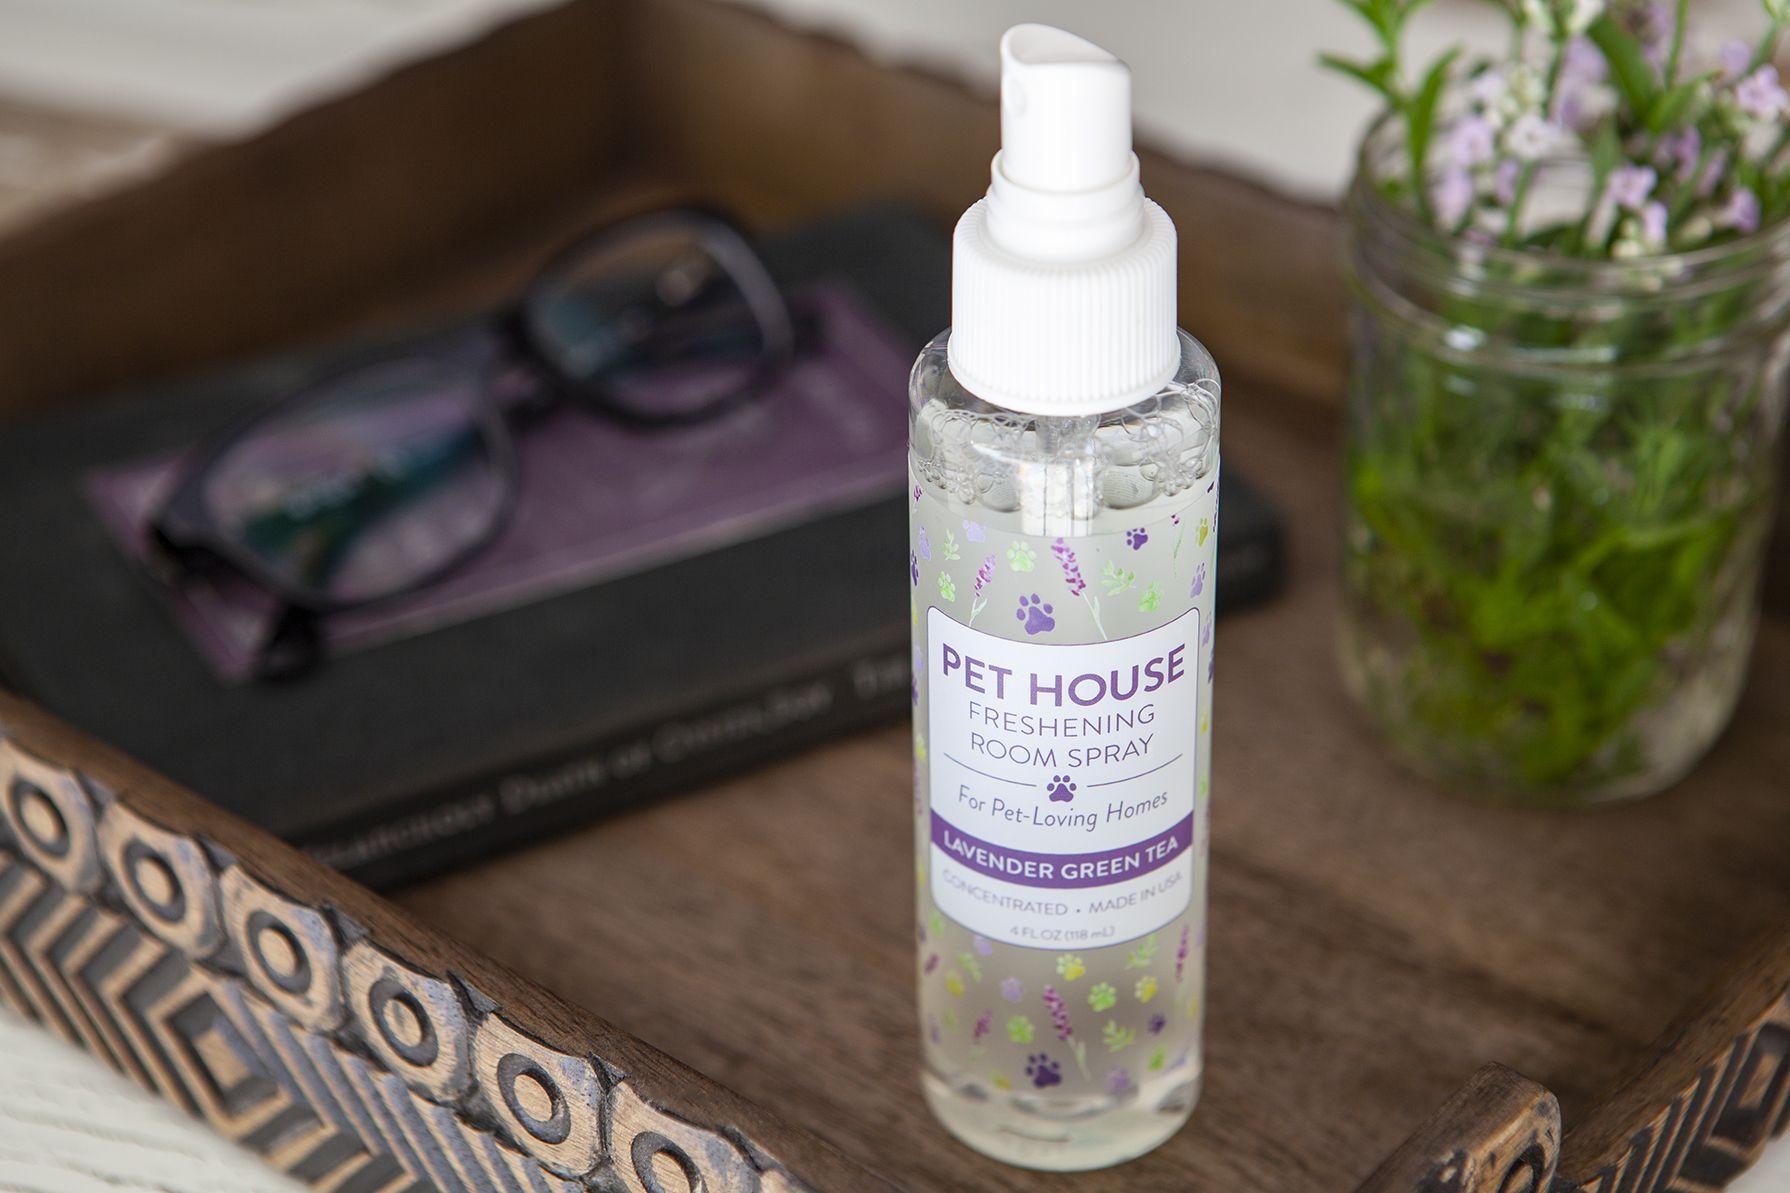 Pet Odor Removing Spray Giftideasforpetparents Giftideas Room